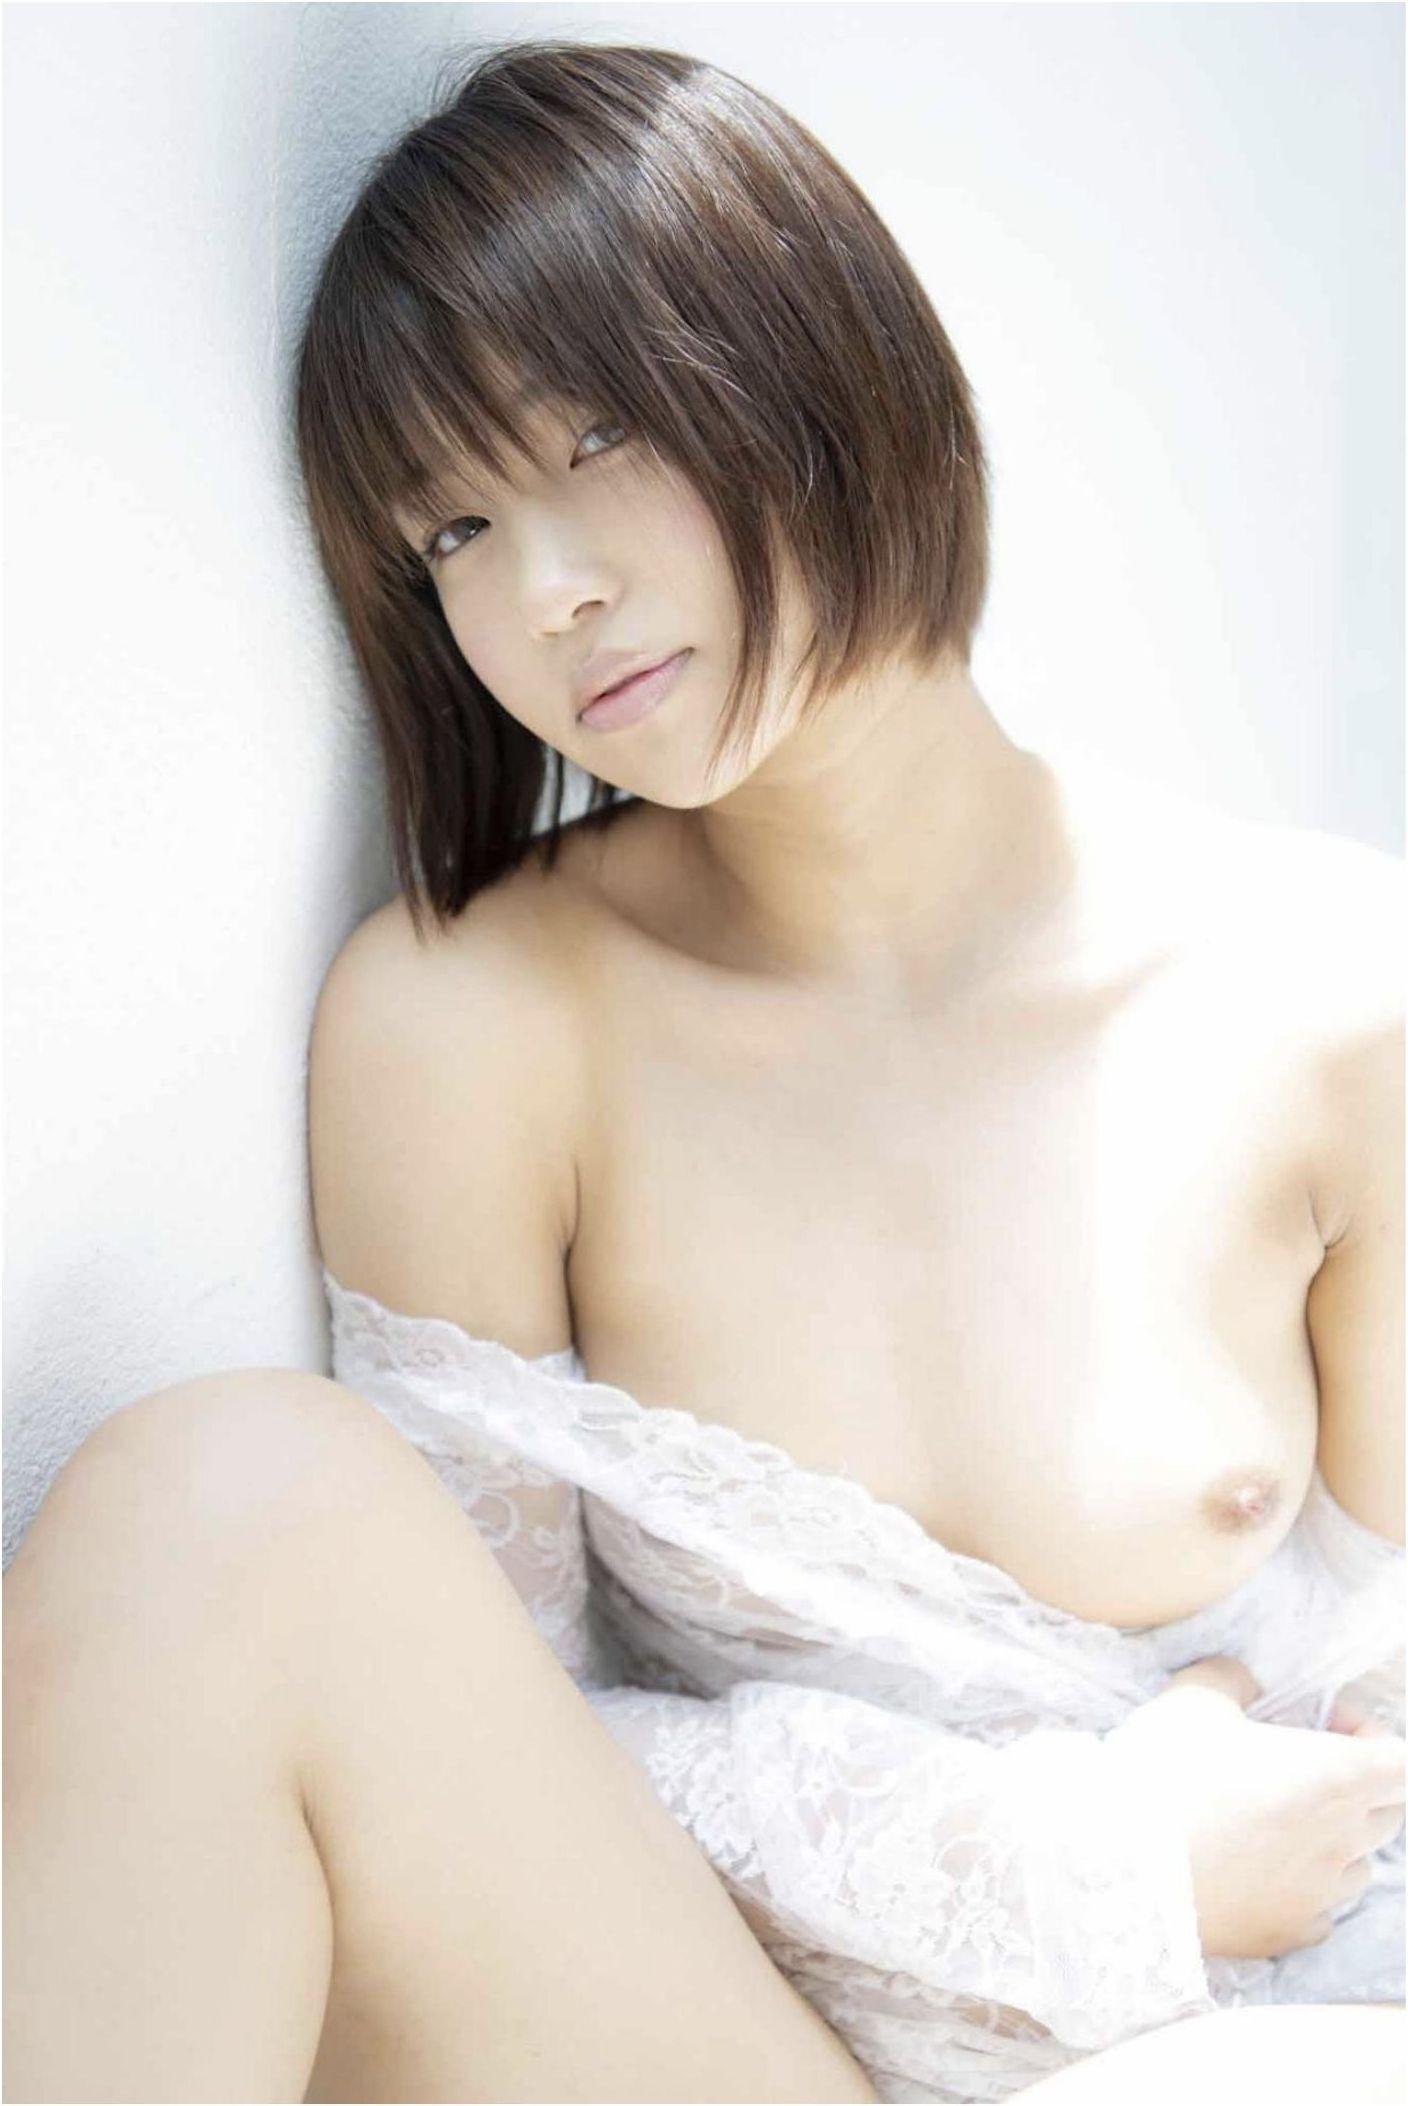 SOFT ON DEMAND GRAVURE COLLECTION 唯井まひろ01 photo 024